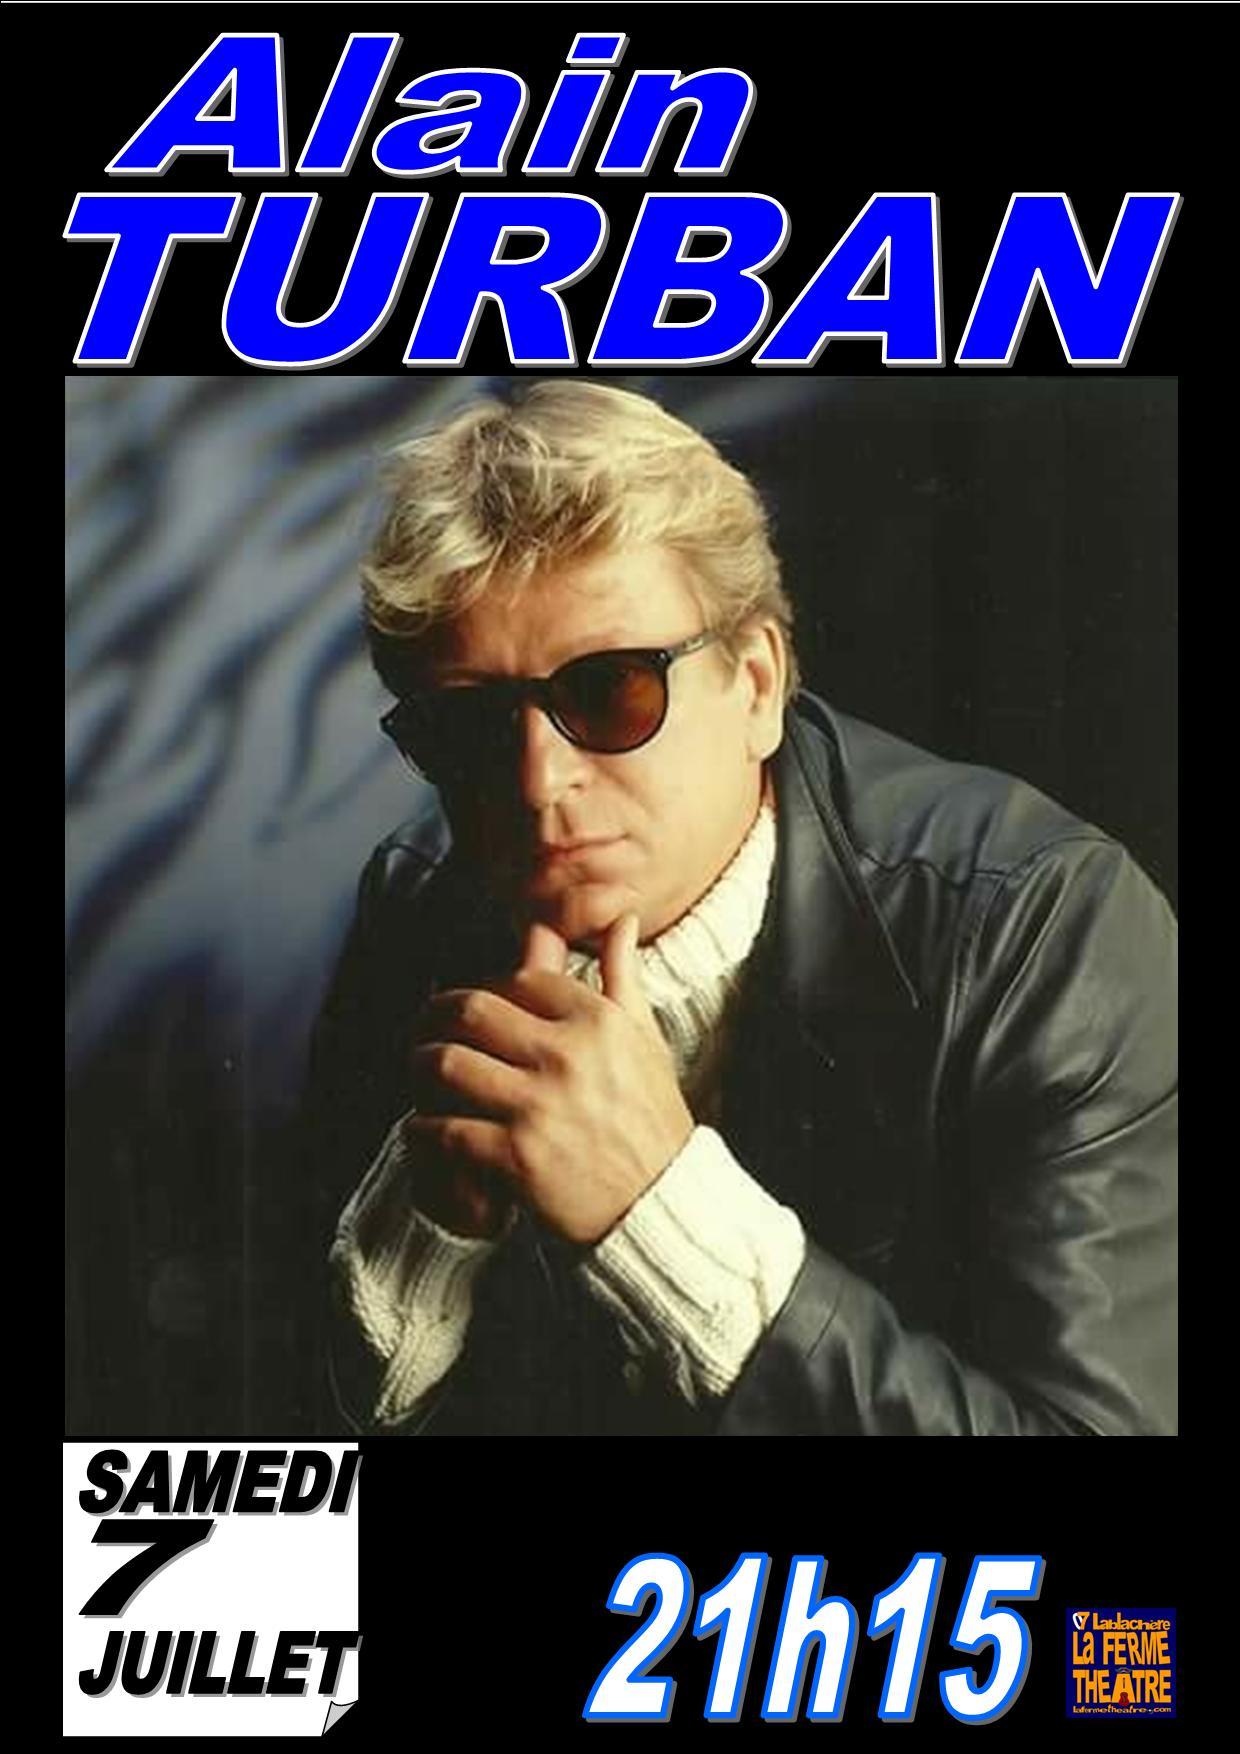 20180707 turban